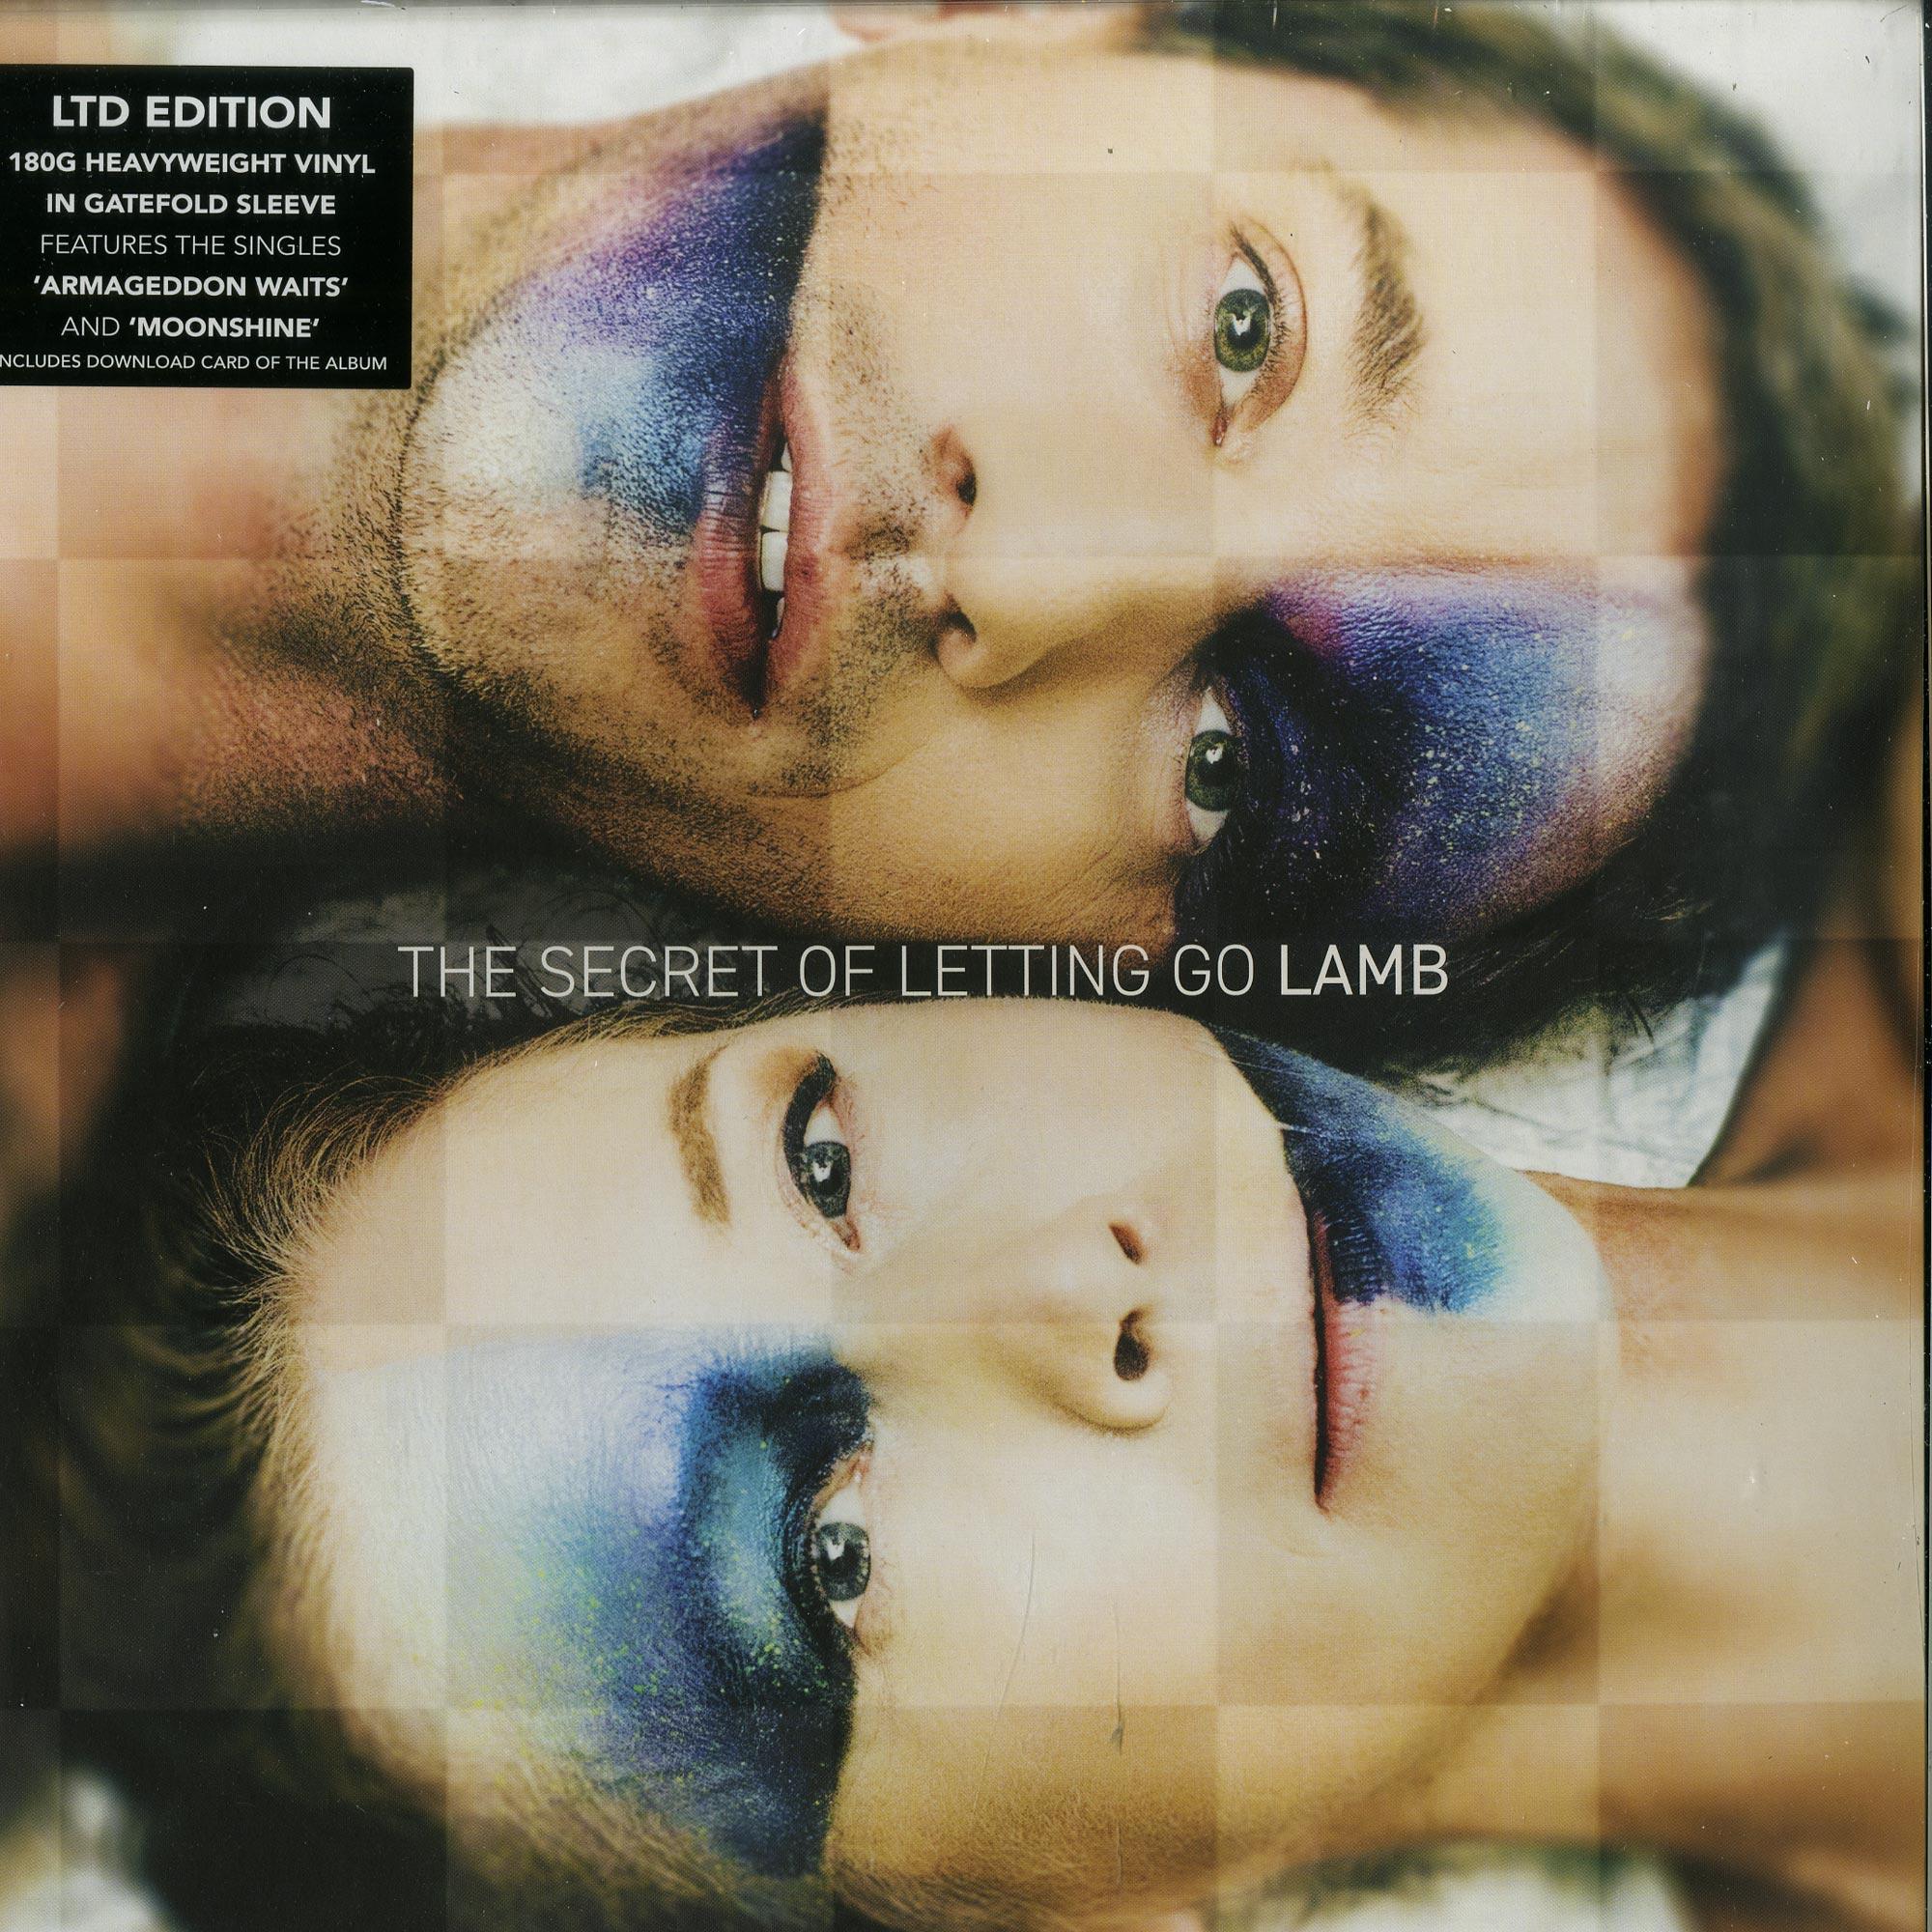 Lamb - THE SECRET OF LETTING GO